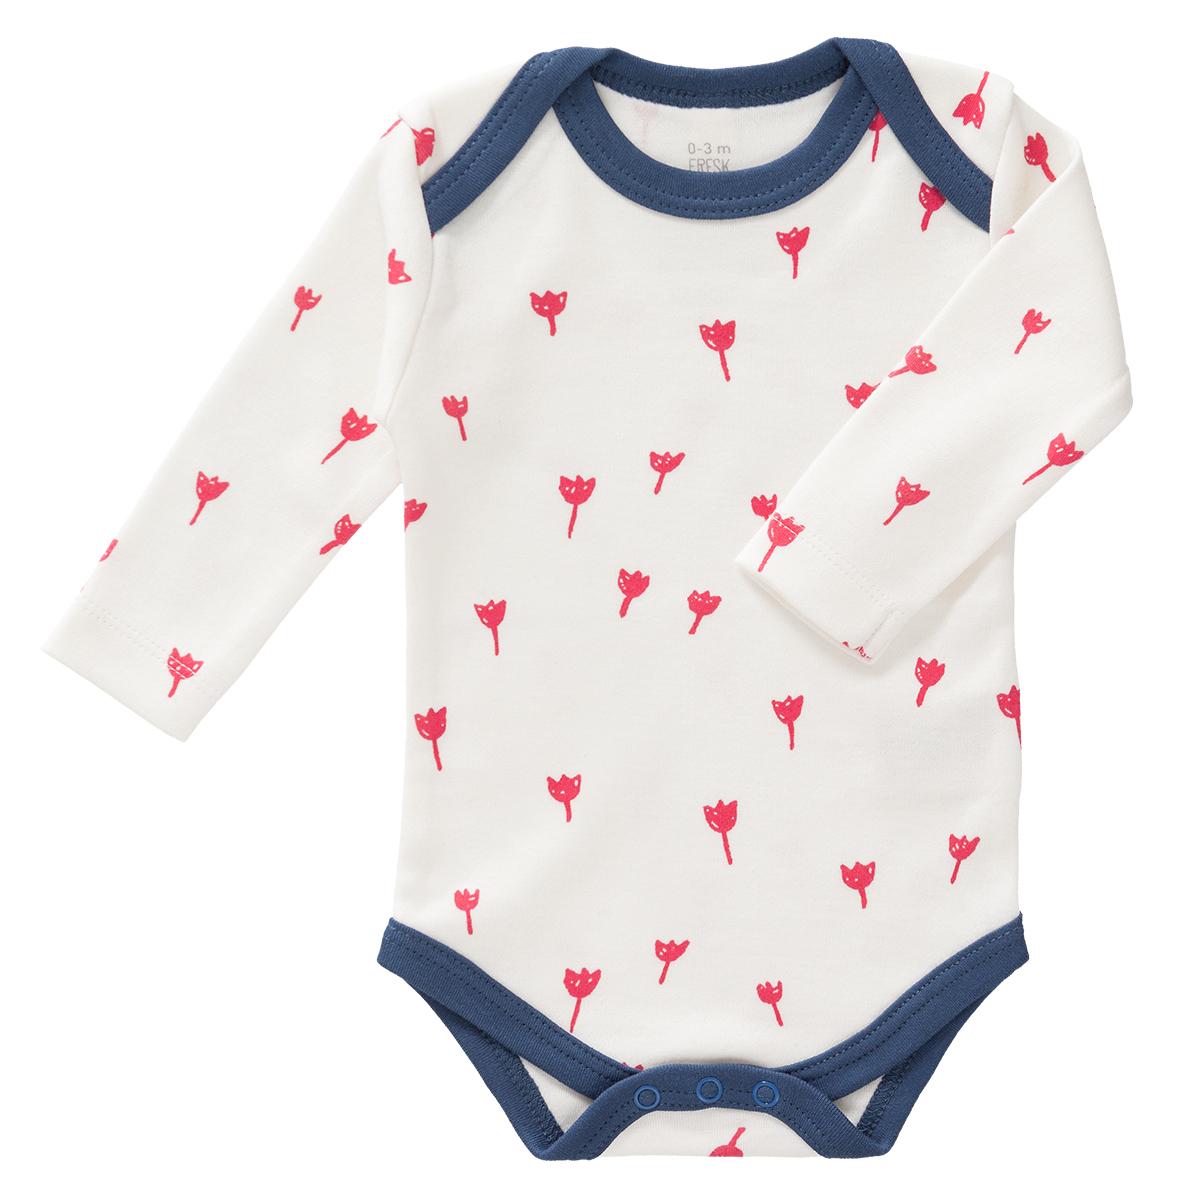 Body & Pyjama Body Manches Longues Tulipes Rouges - 3/6 Mois